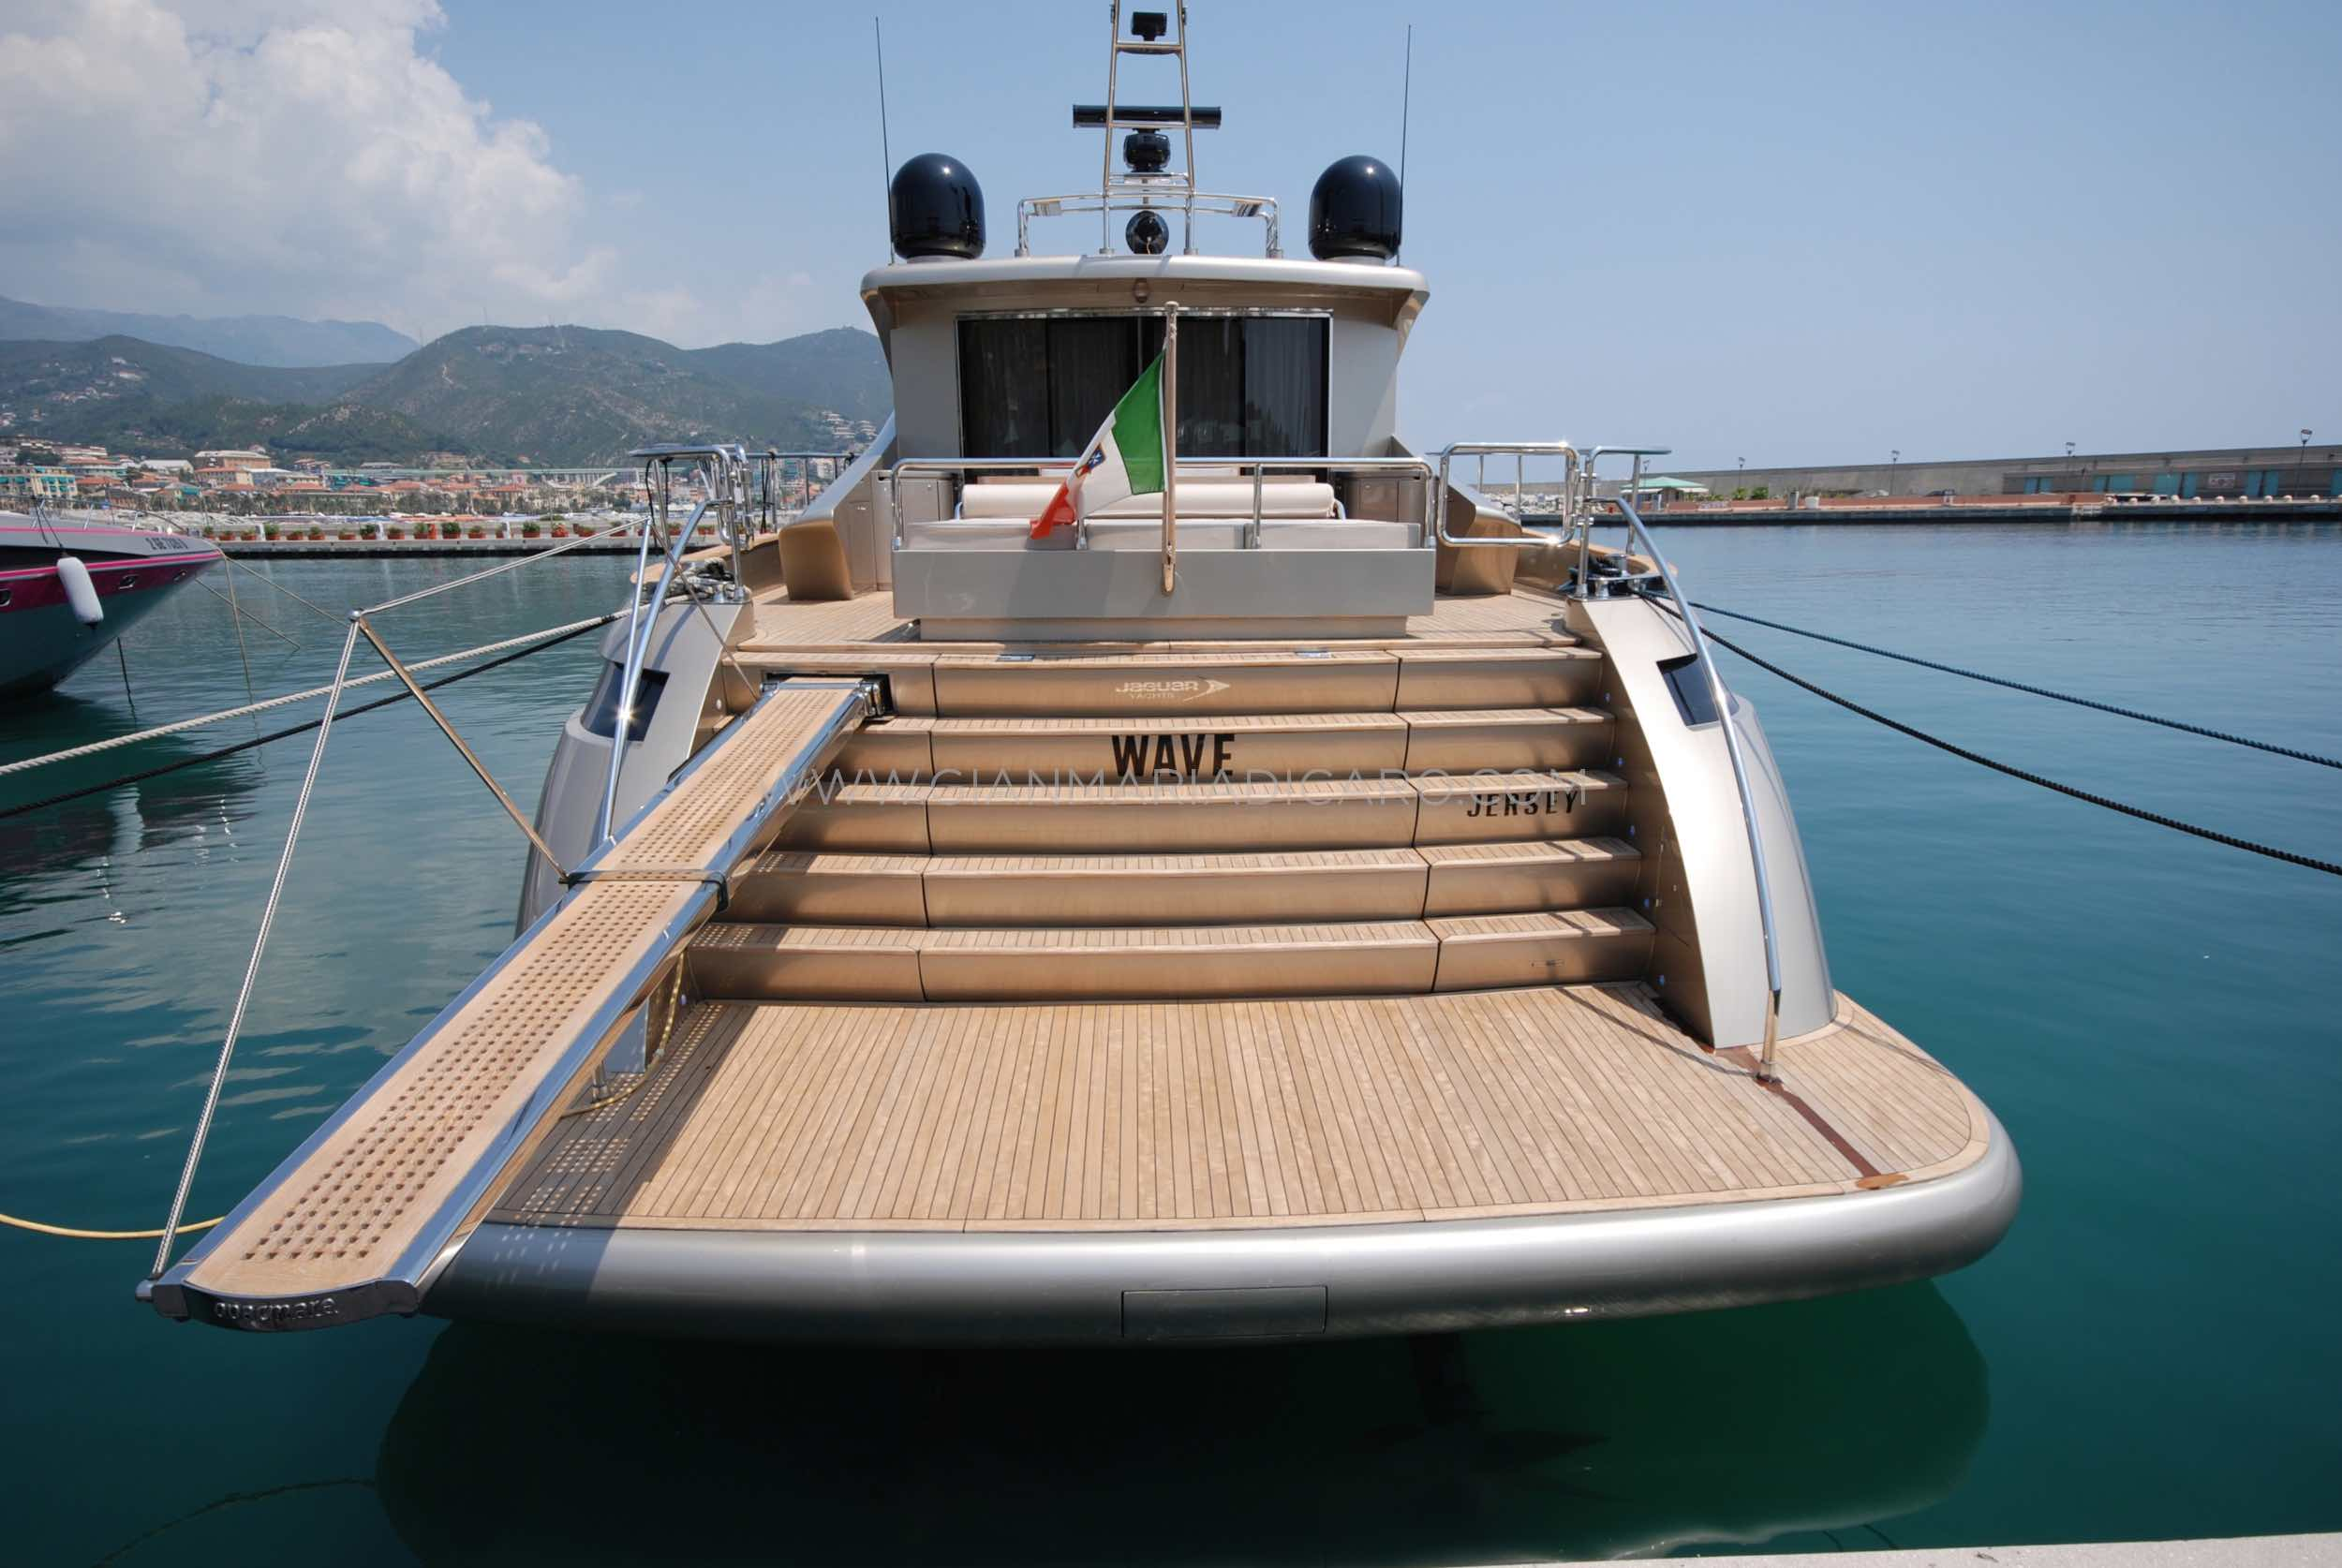 italian-yachts-jaguar-80-miss-11-for-sale-4.jpg